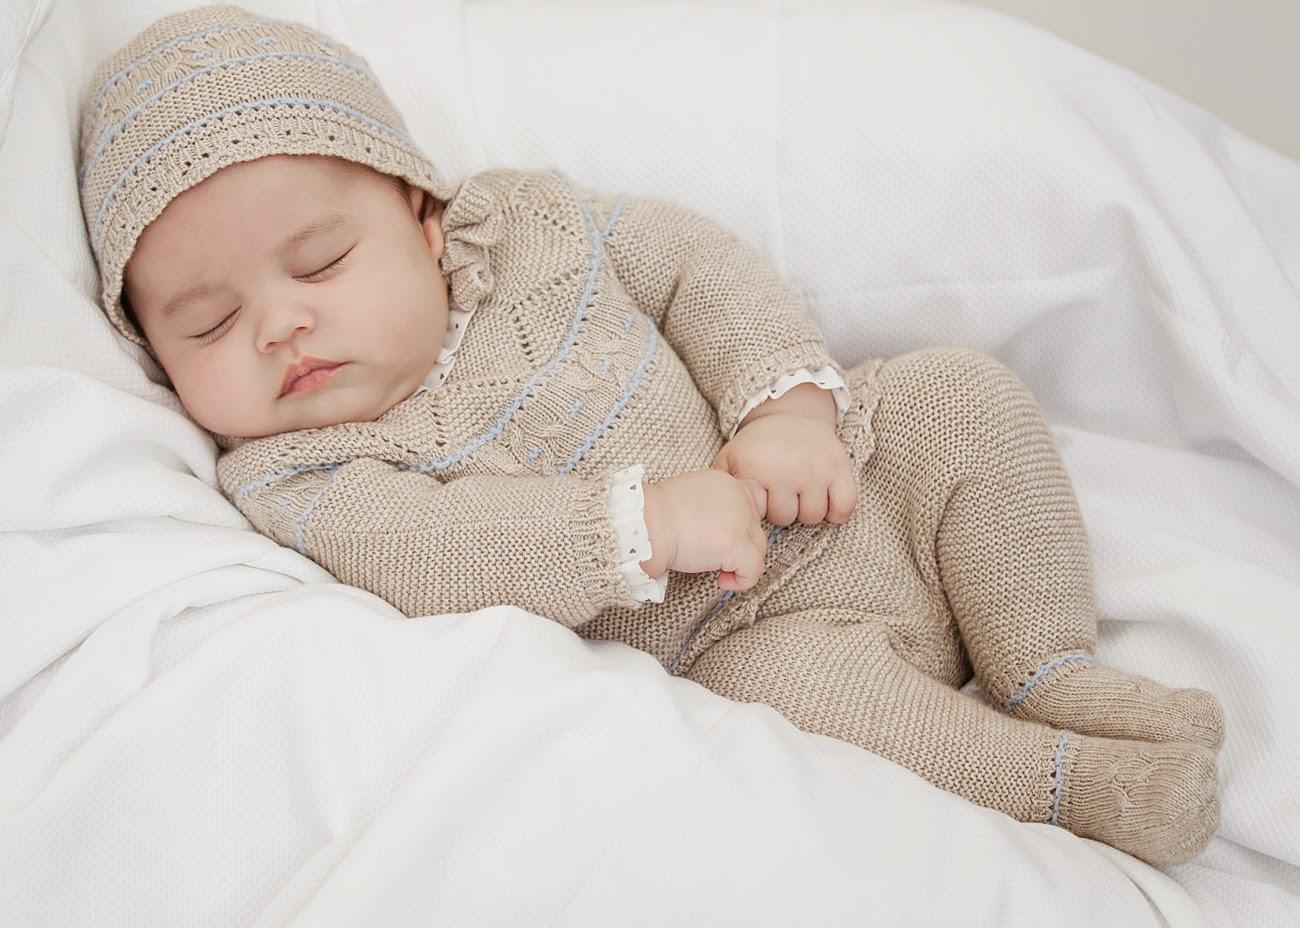 051a38845 Moda infantil otoño invierno 2014-15 de Pili Carrera